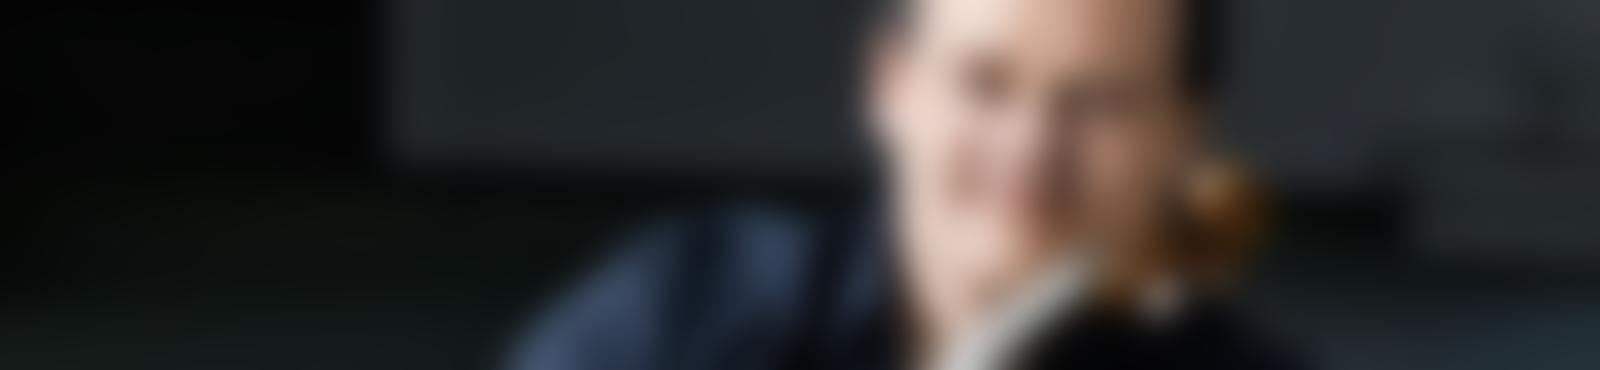 Blurred e9c5ed01 d031 4d7d ba77 cdfc0da900f2